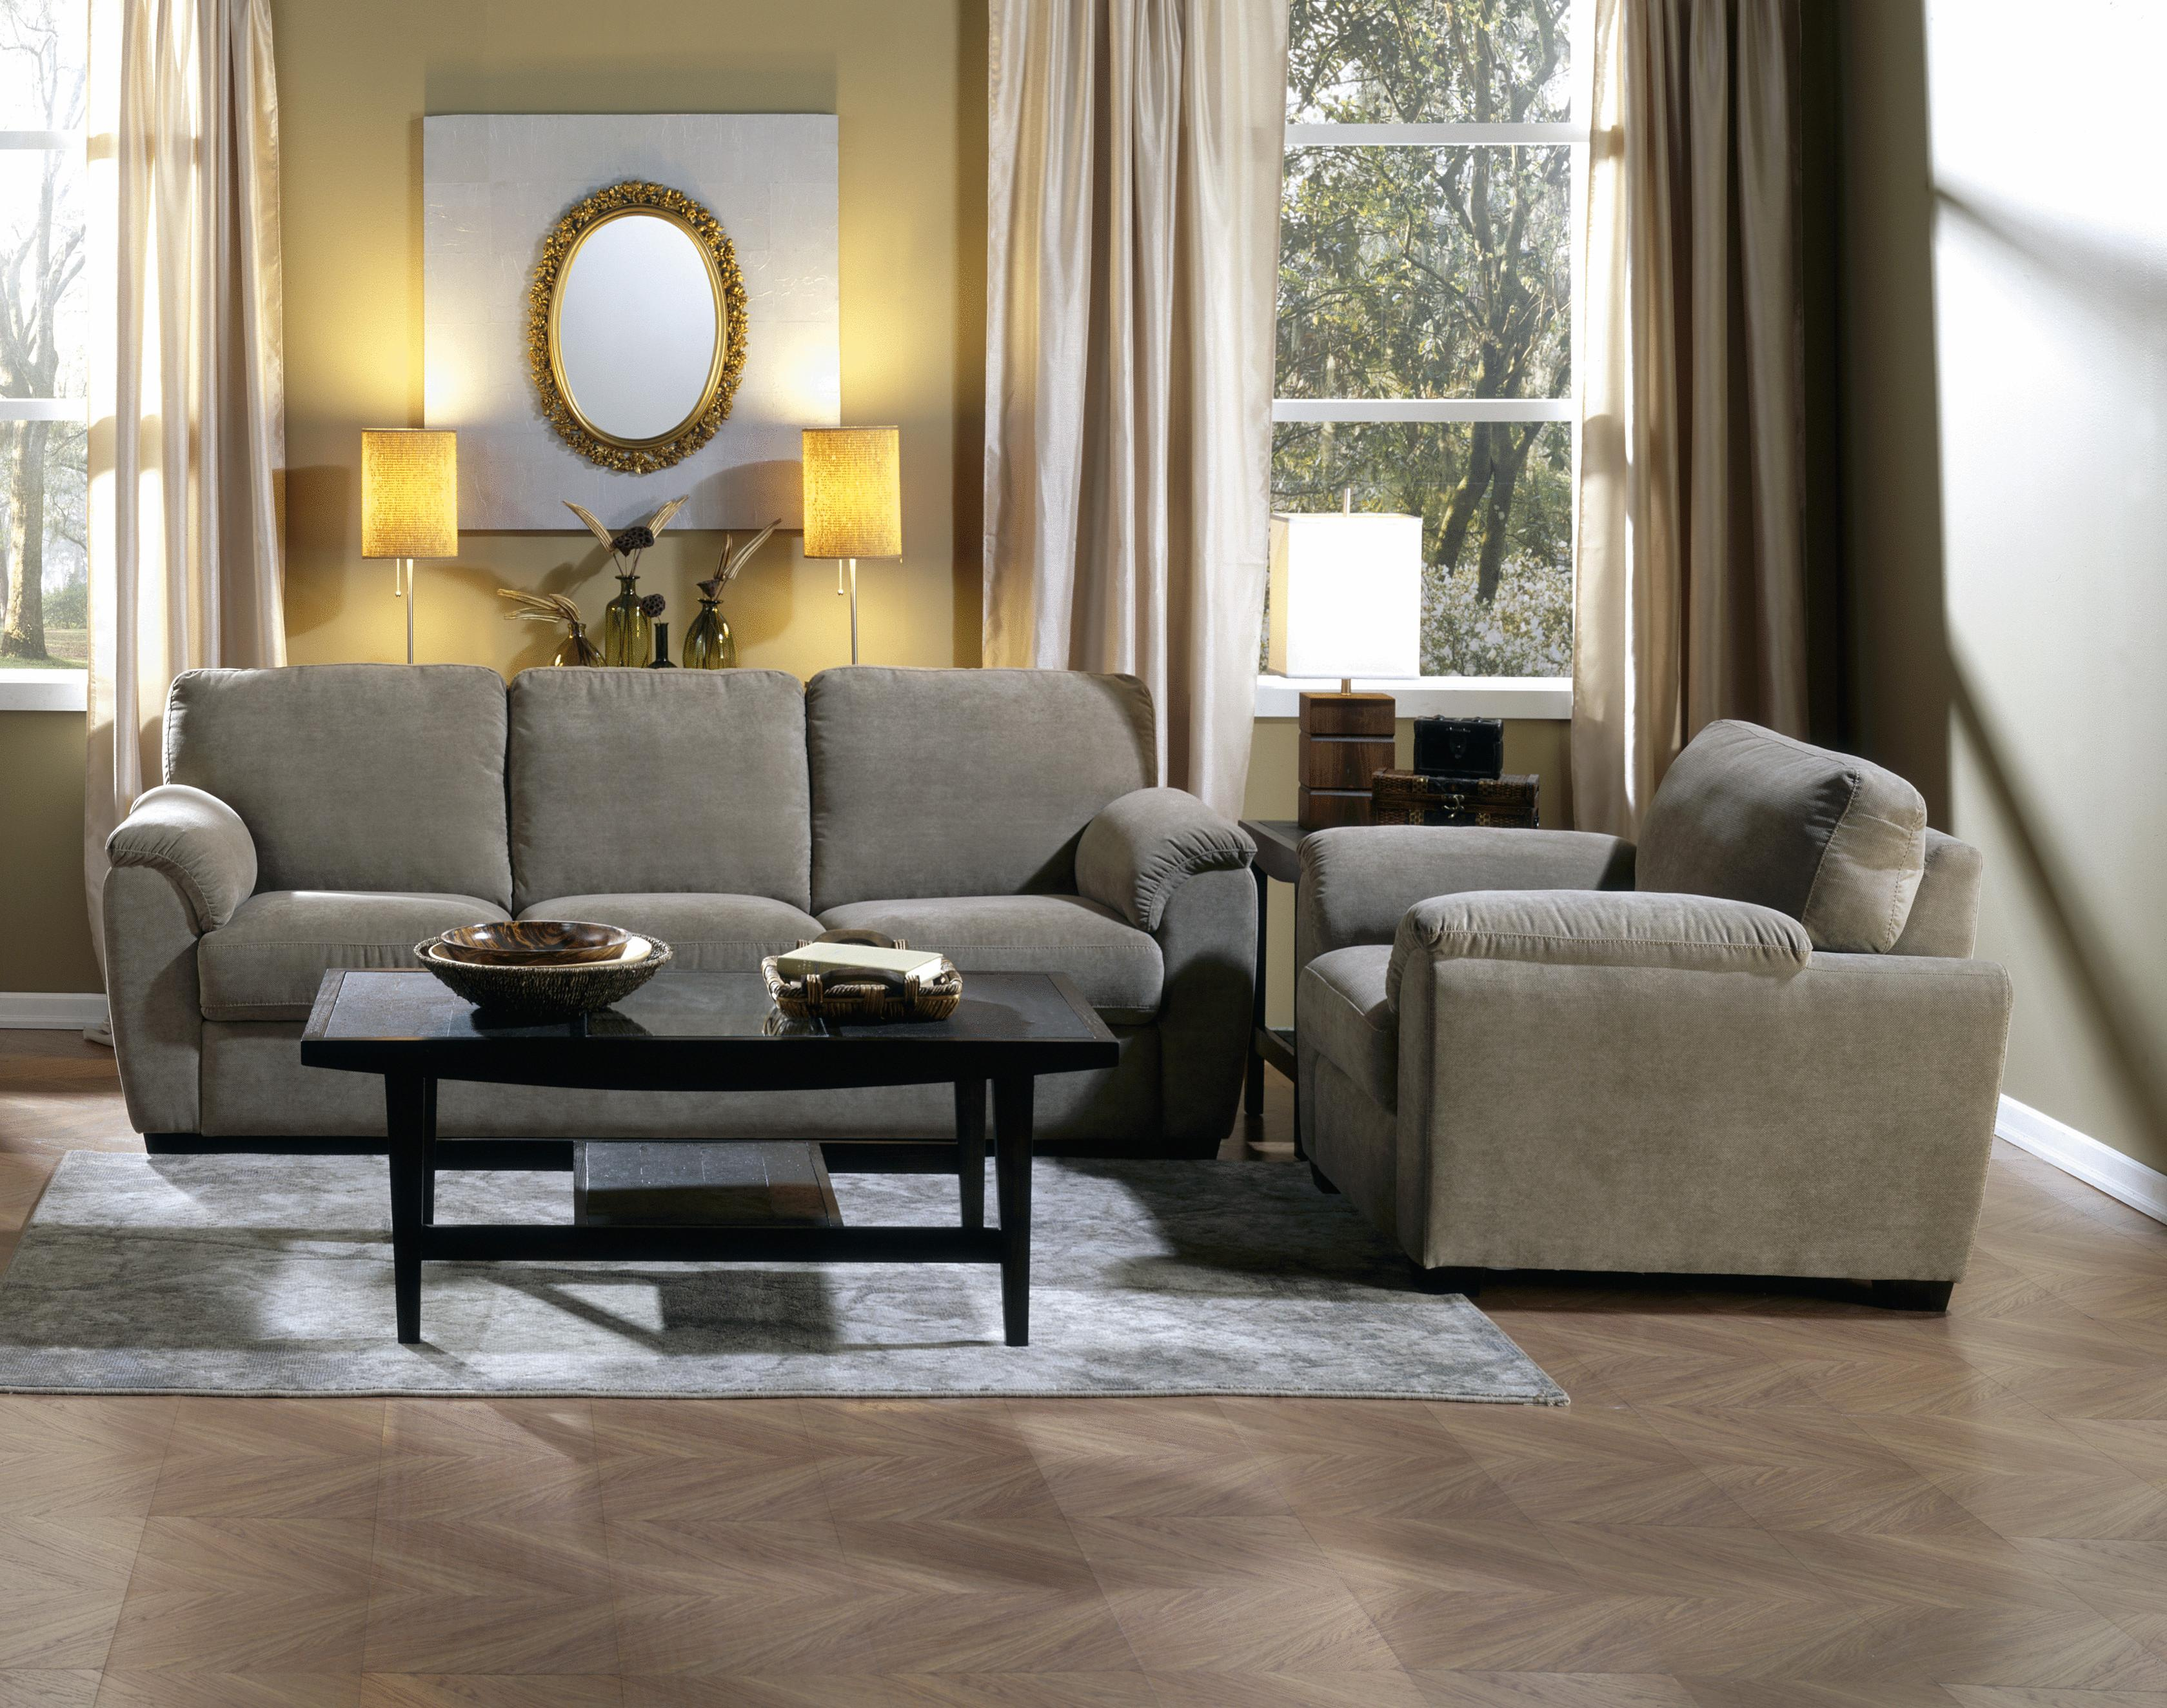 Palliser Lanza Casual Square Sectional Sofa Jordan s Home